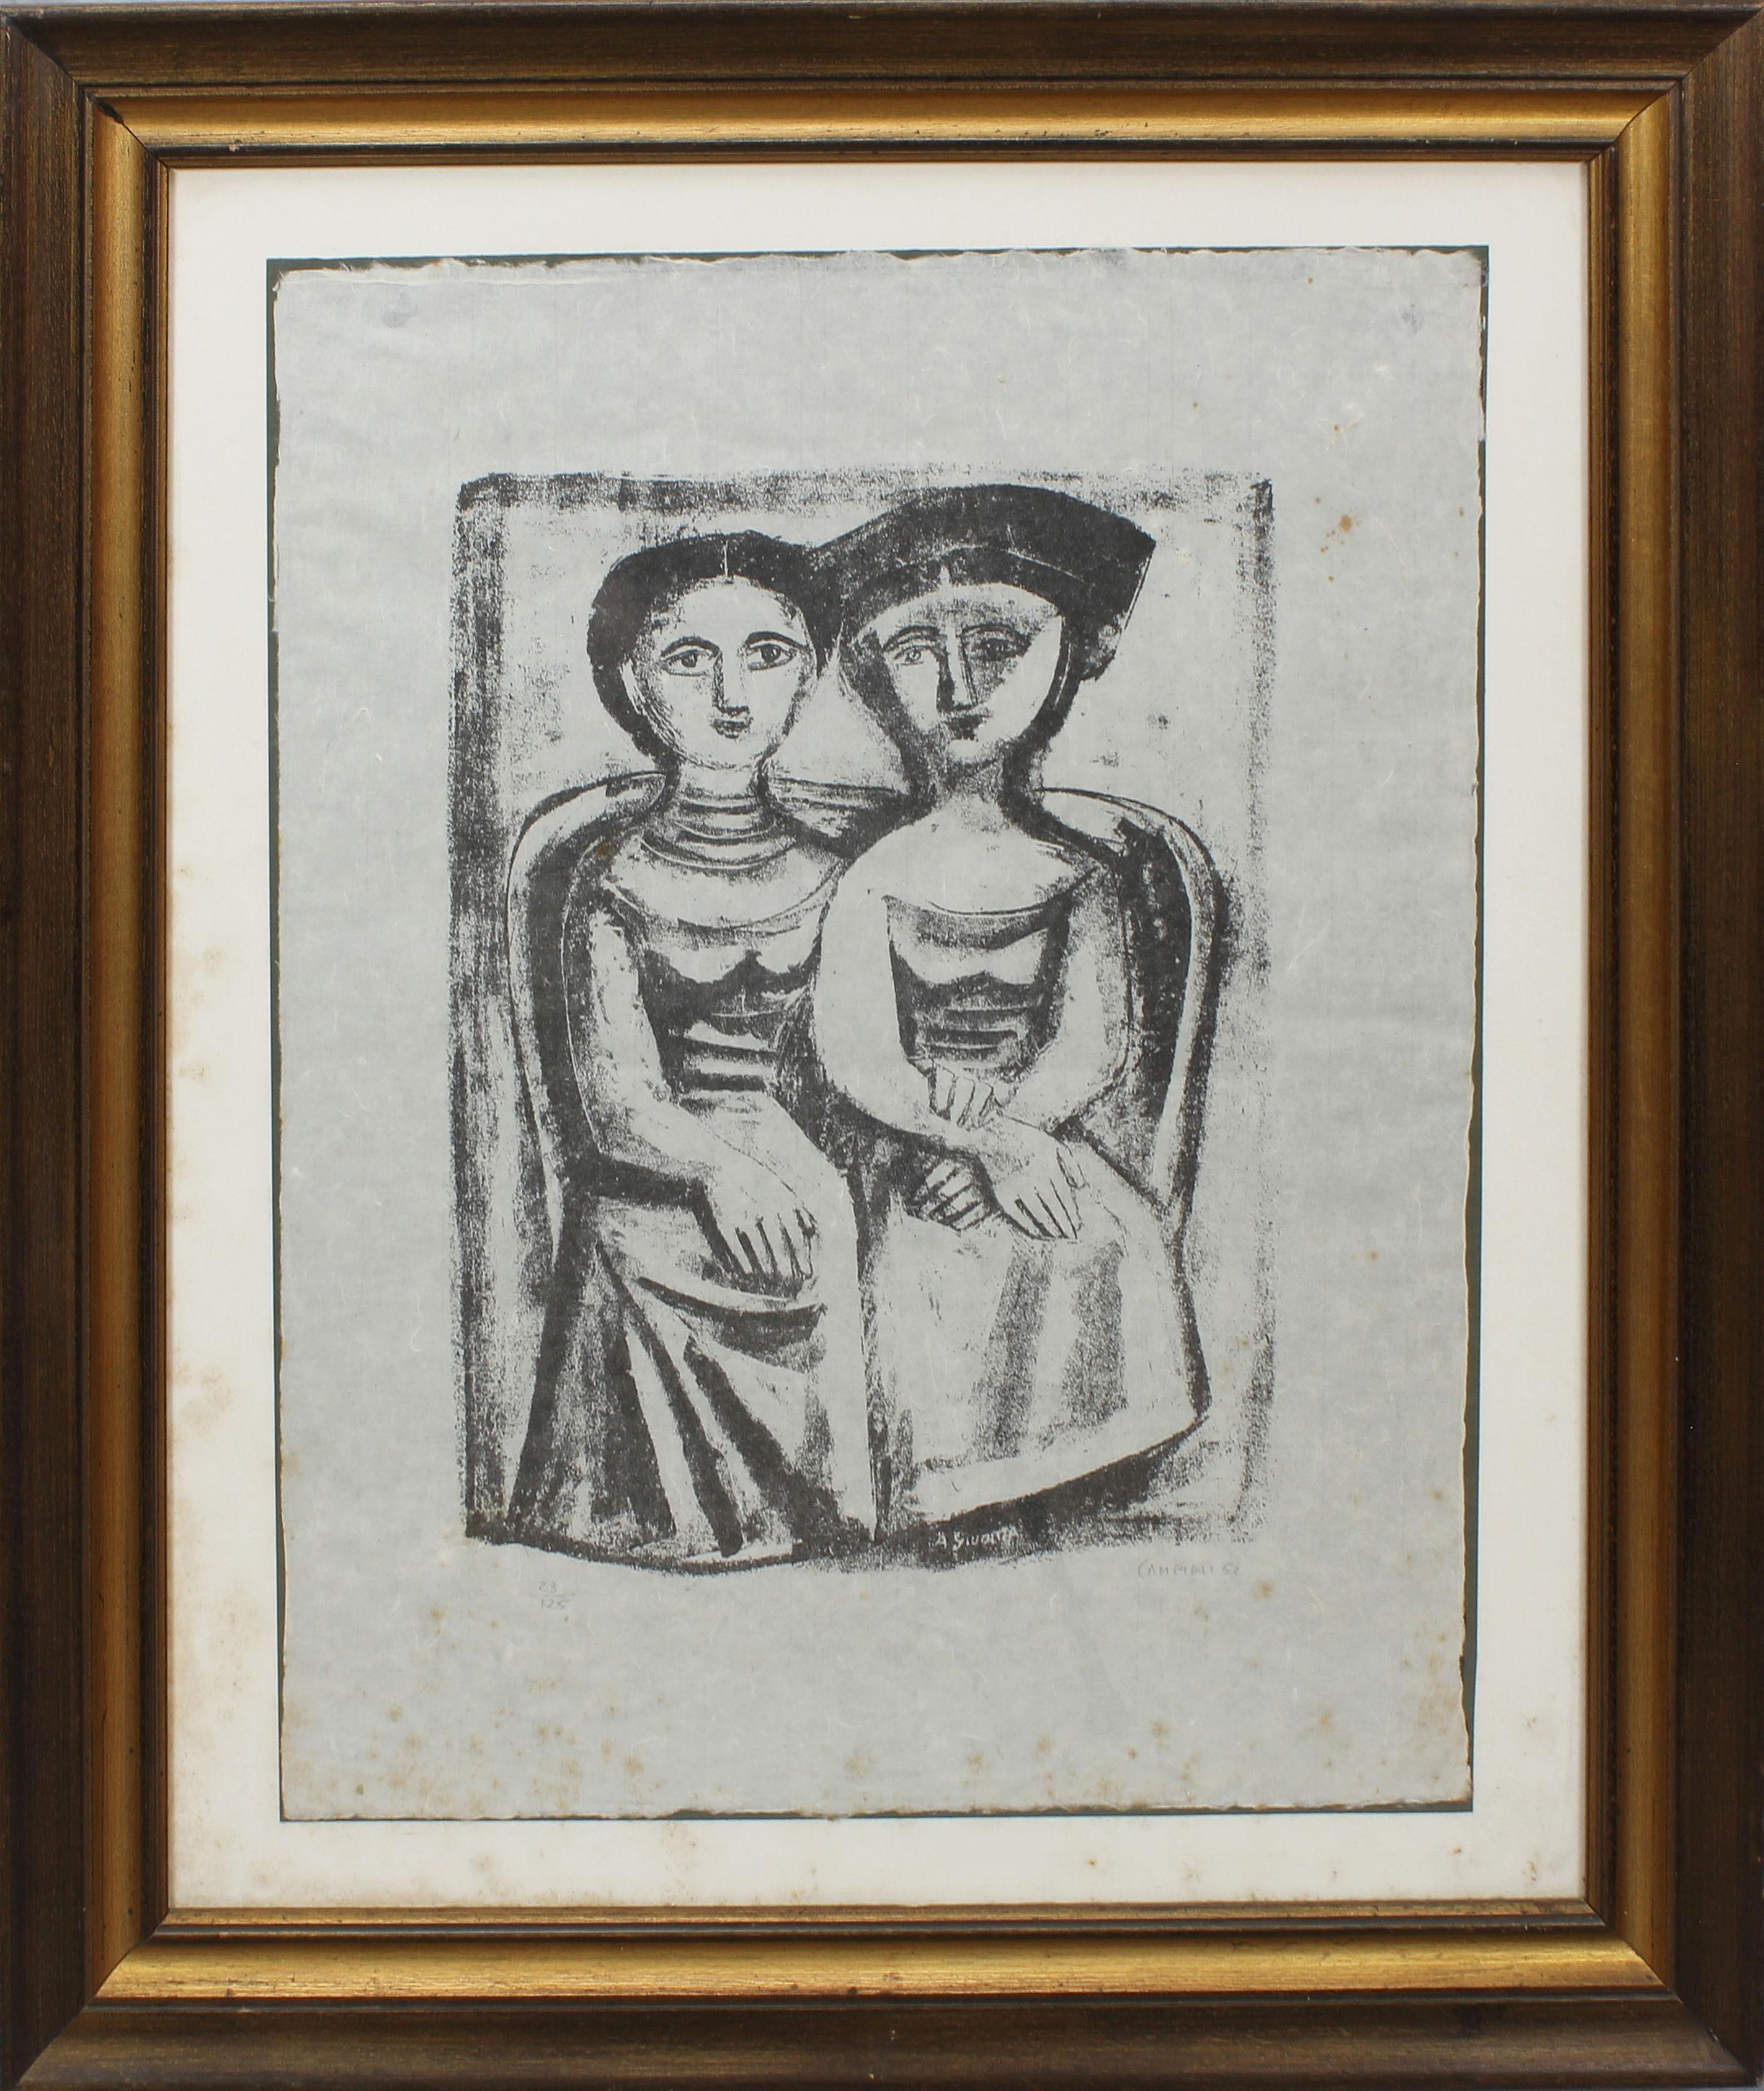 Lot 14 - Due donne, grafica su carta, firmata Campigli 52, 23/125, cm. 48x63